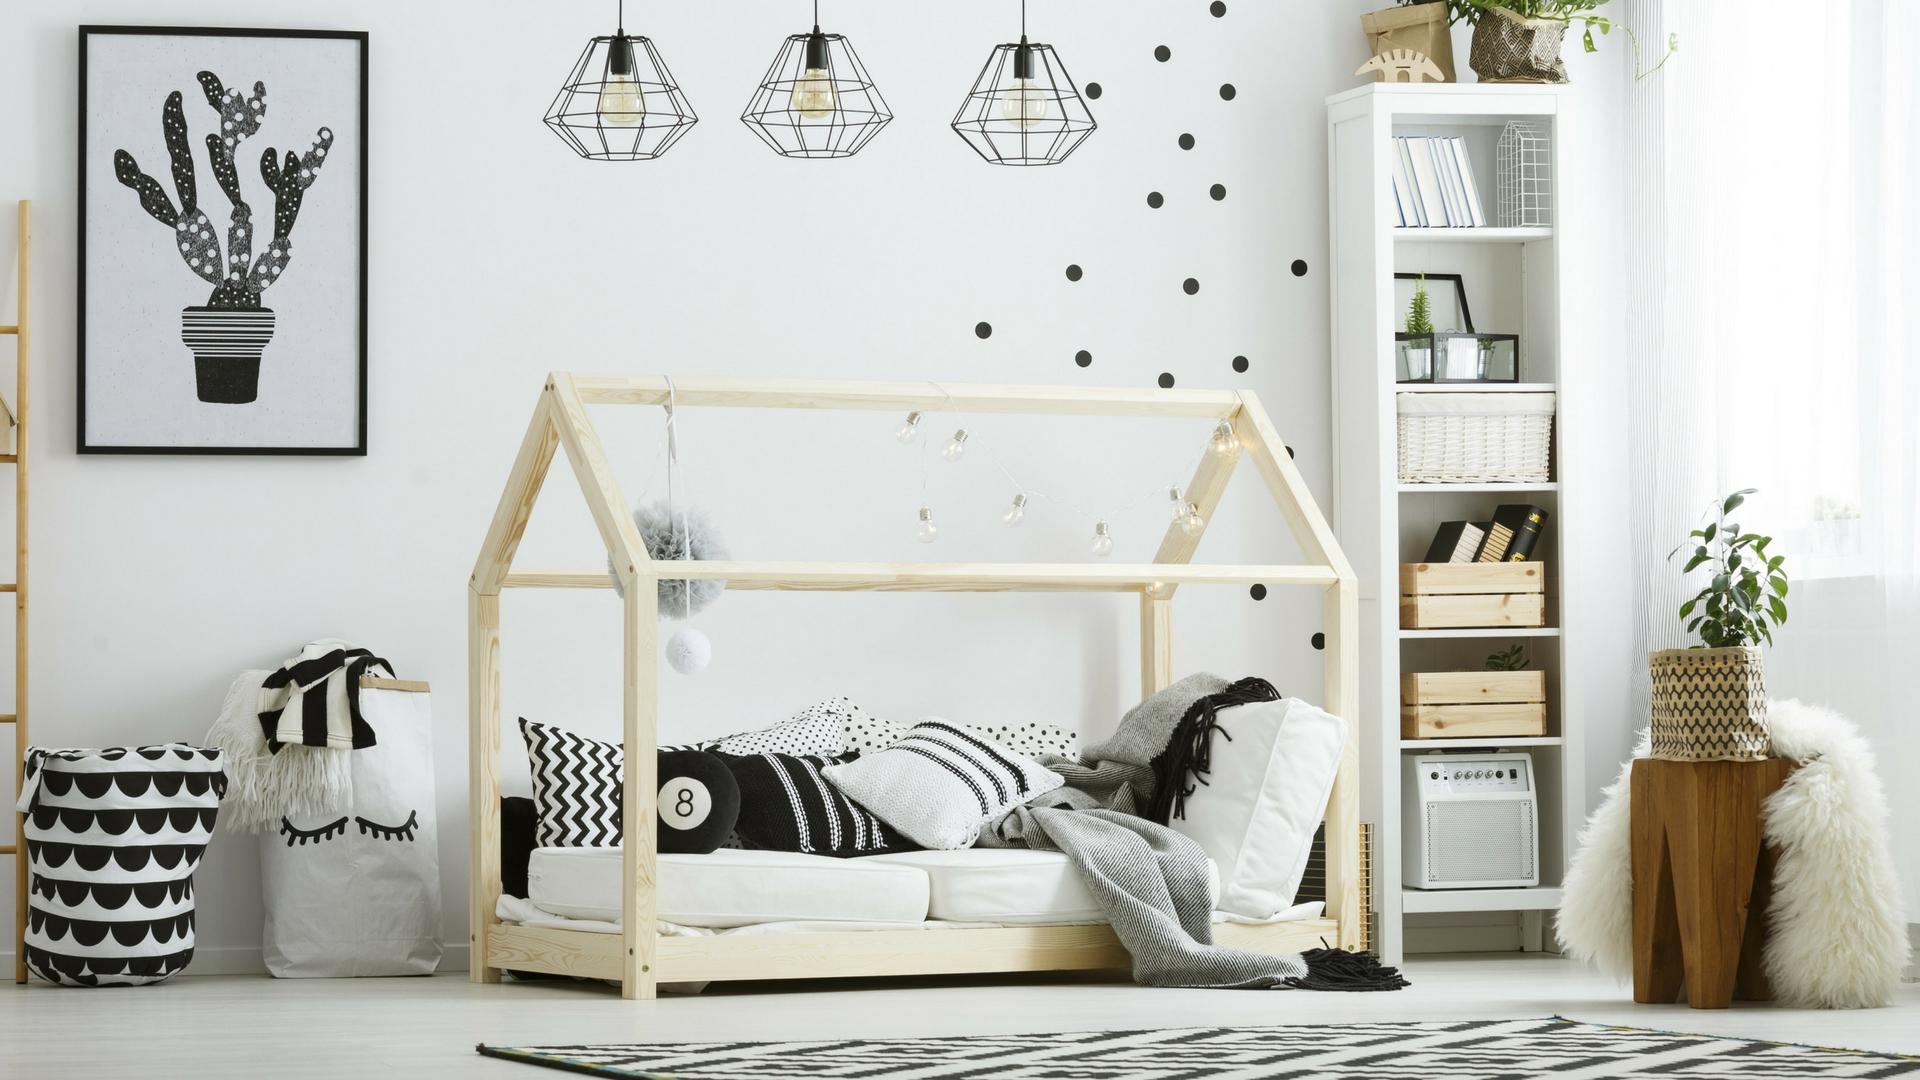 Design allure interior design home staging for Interior design and staging